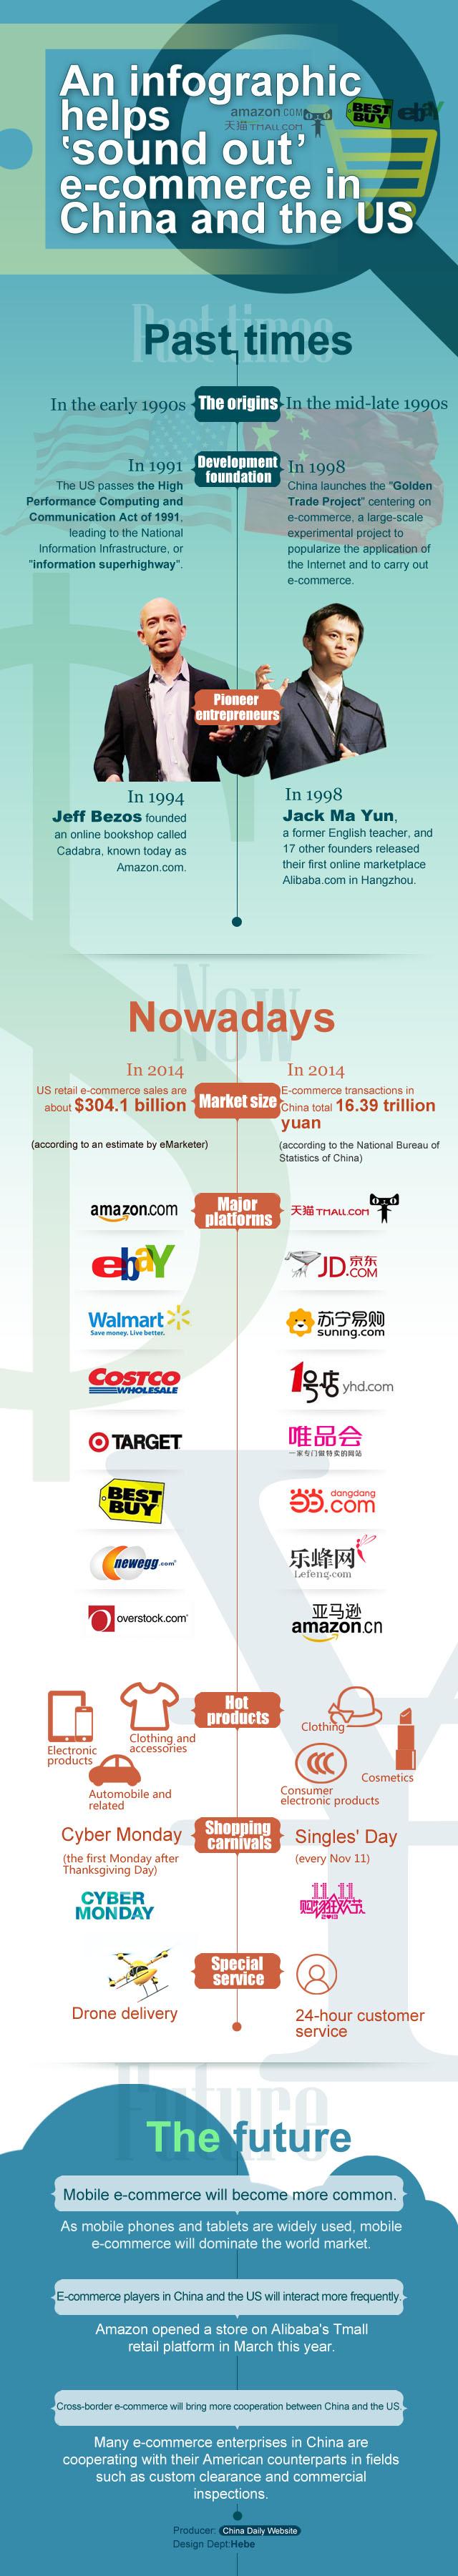 China eCommerce development